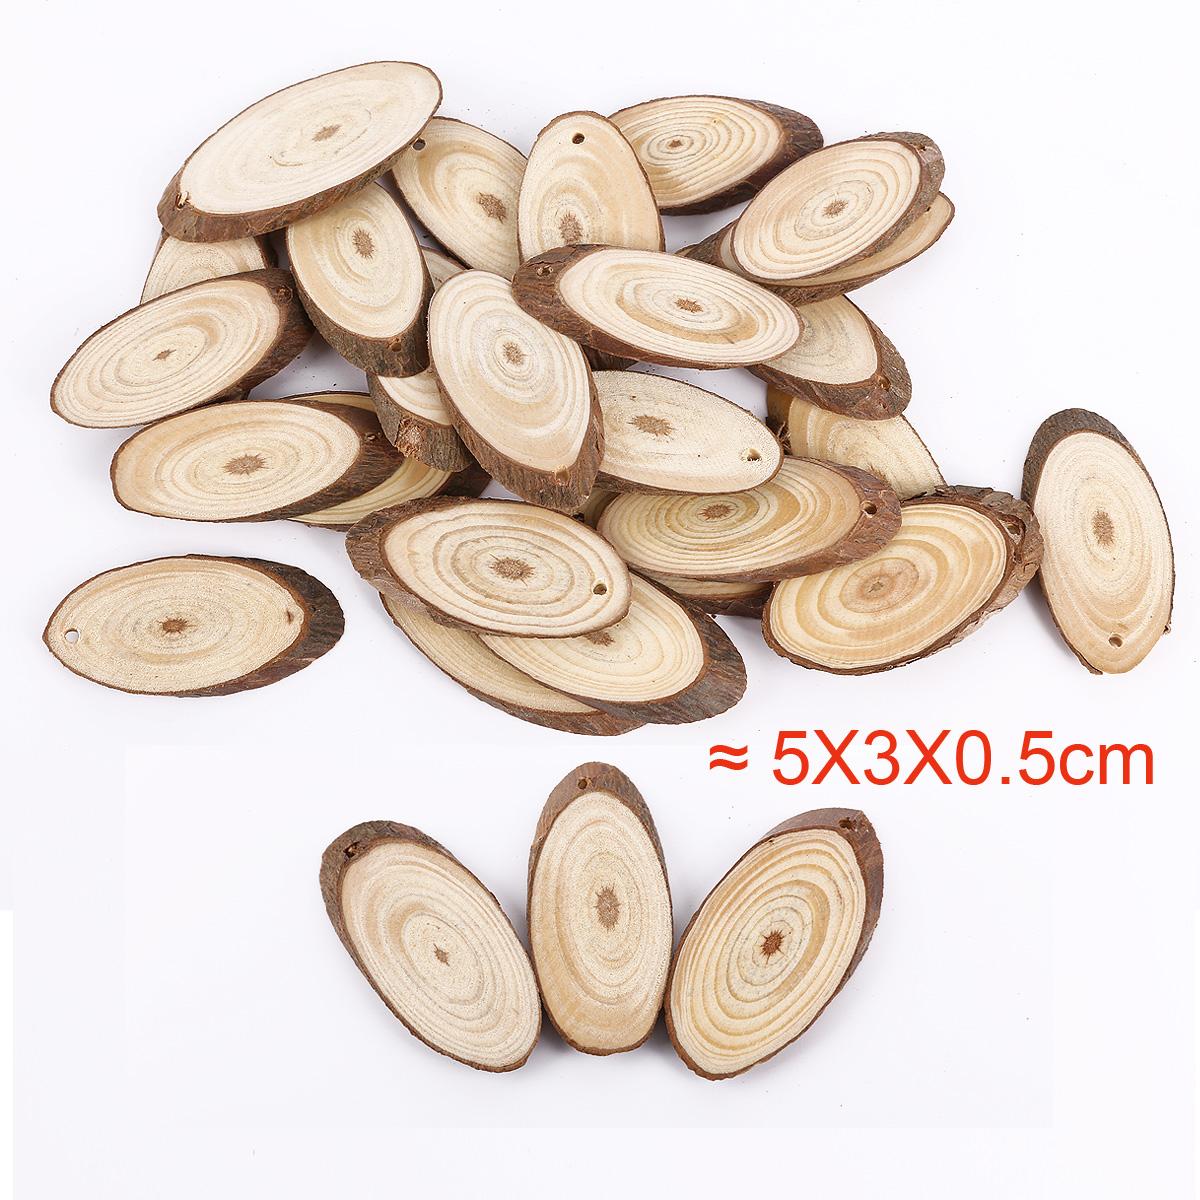 Wooden Log Slices Discs Natural Tree Bark Decorative Round